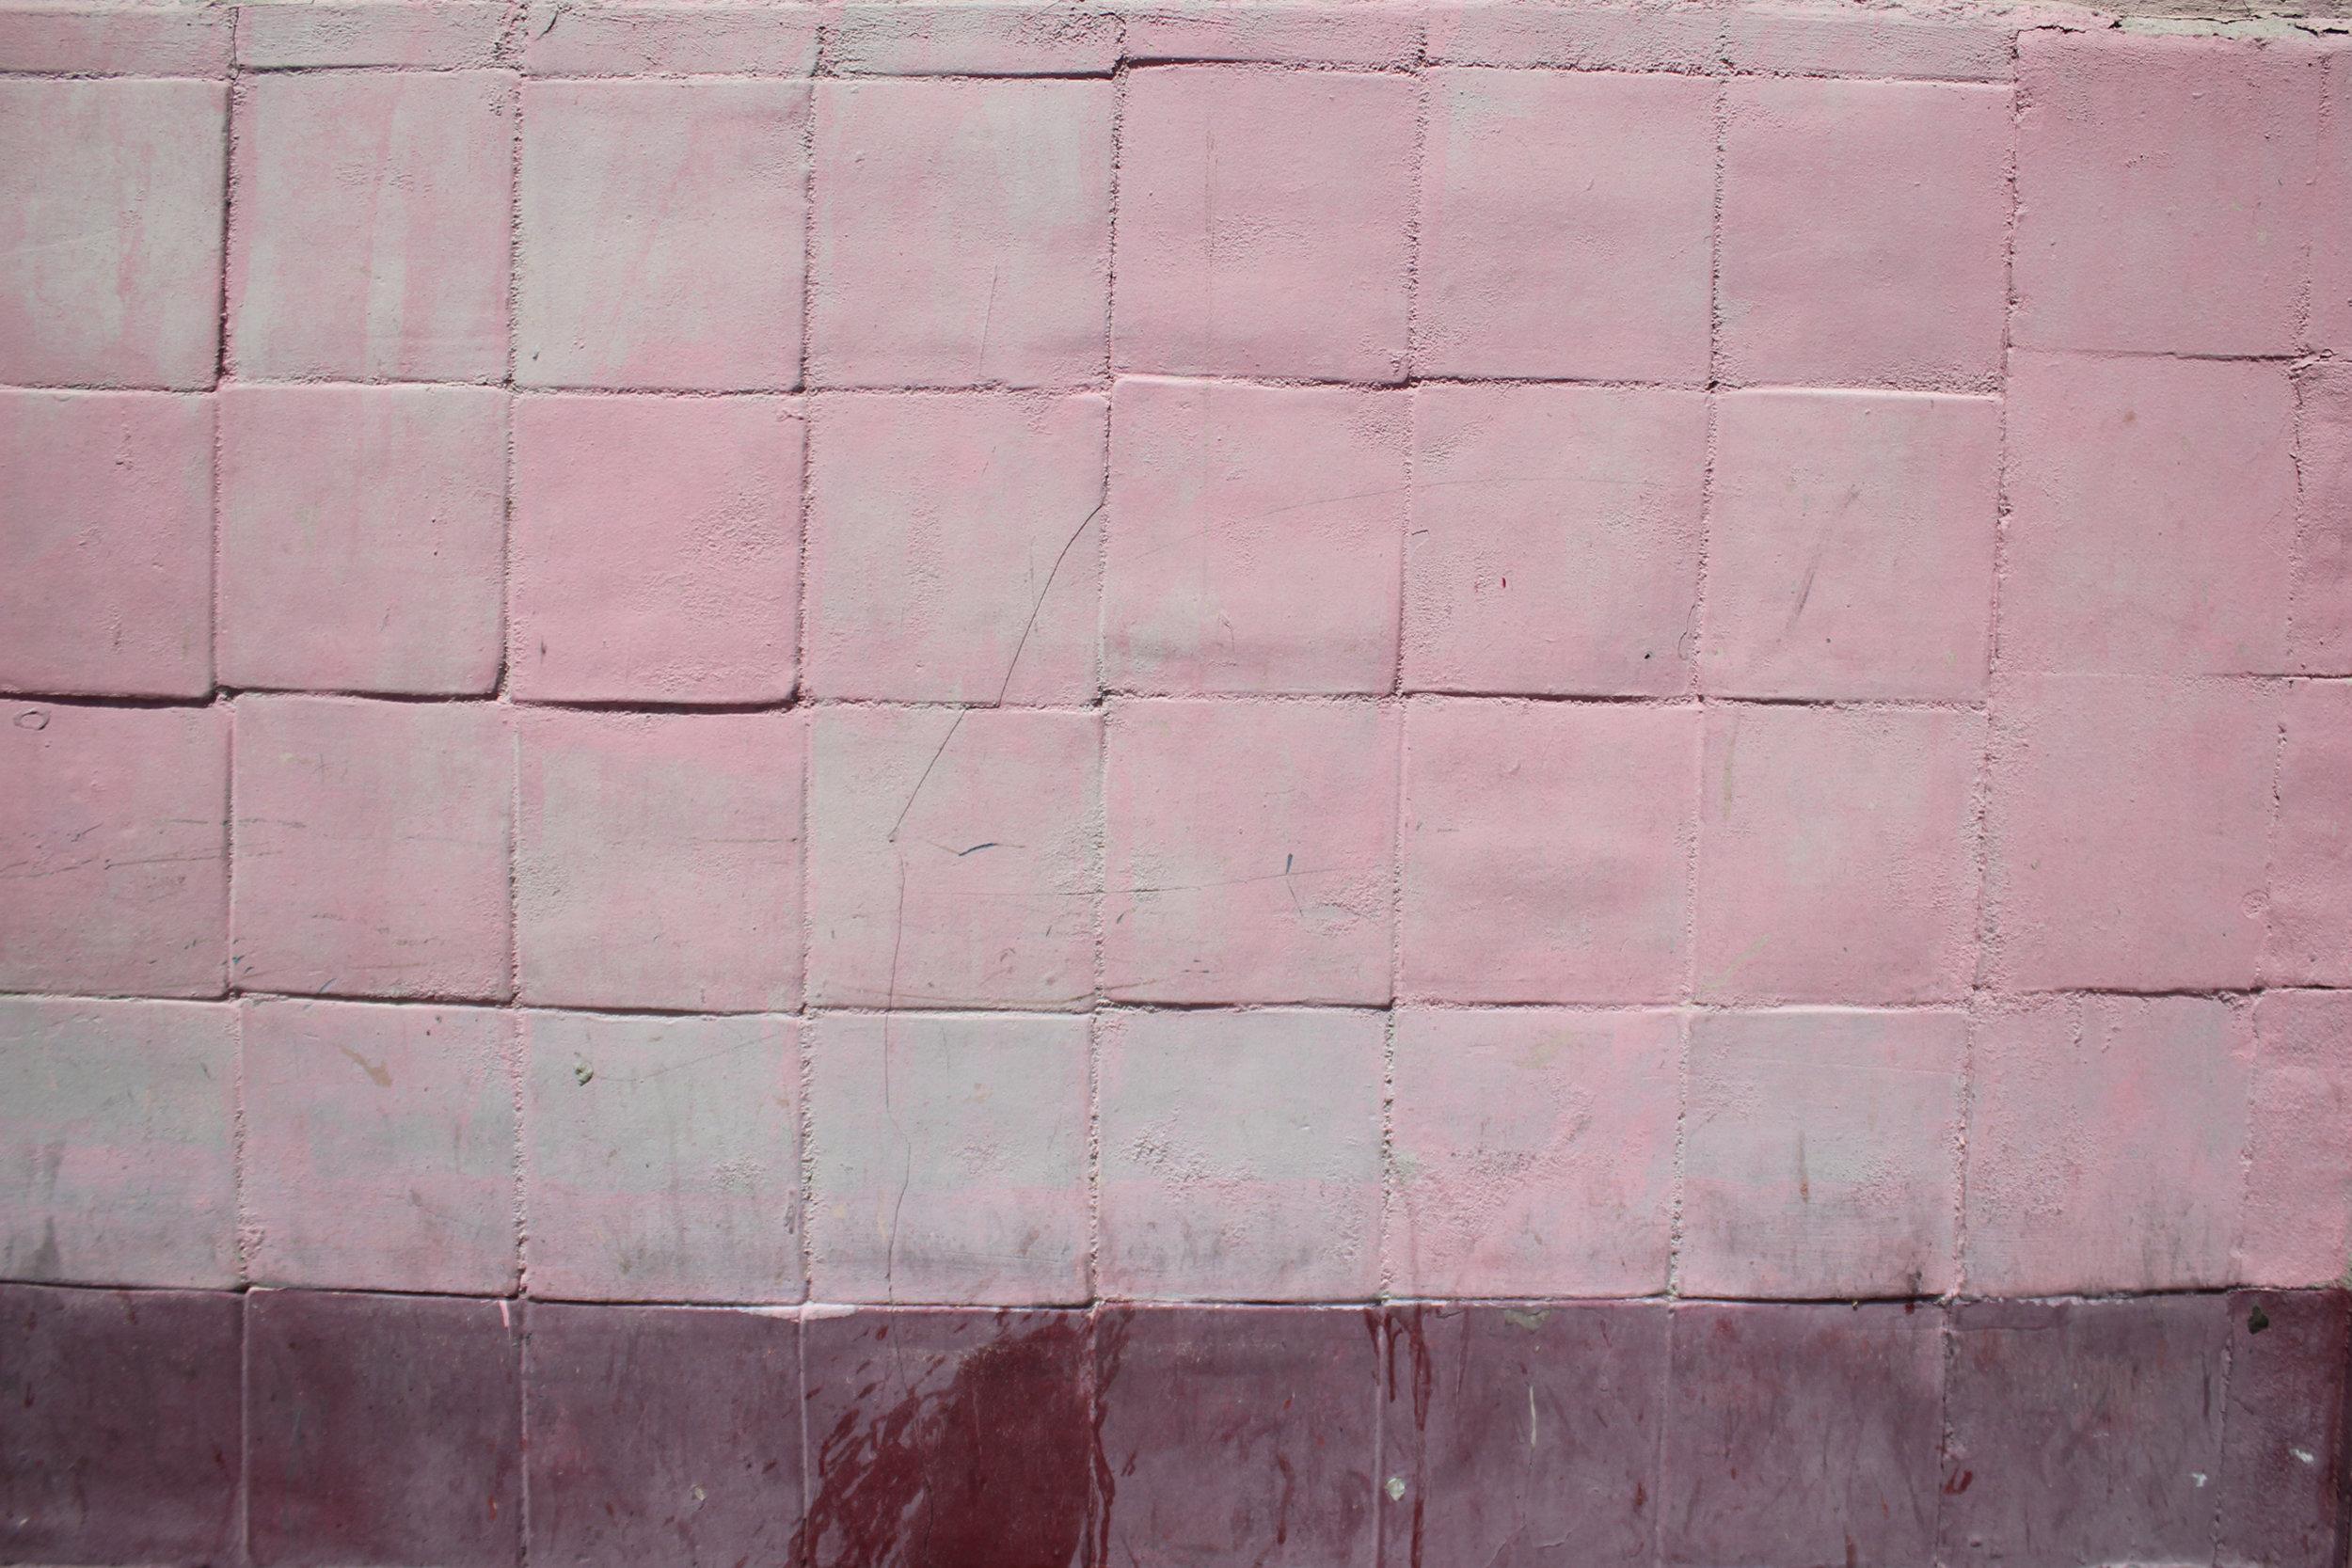 El Paso Texas Pink Tiles The Colorist Sophia N. Ahmad